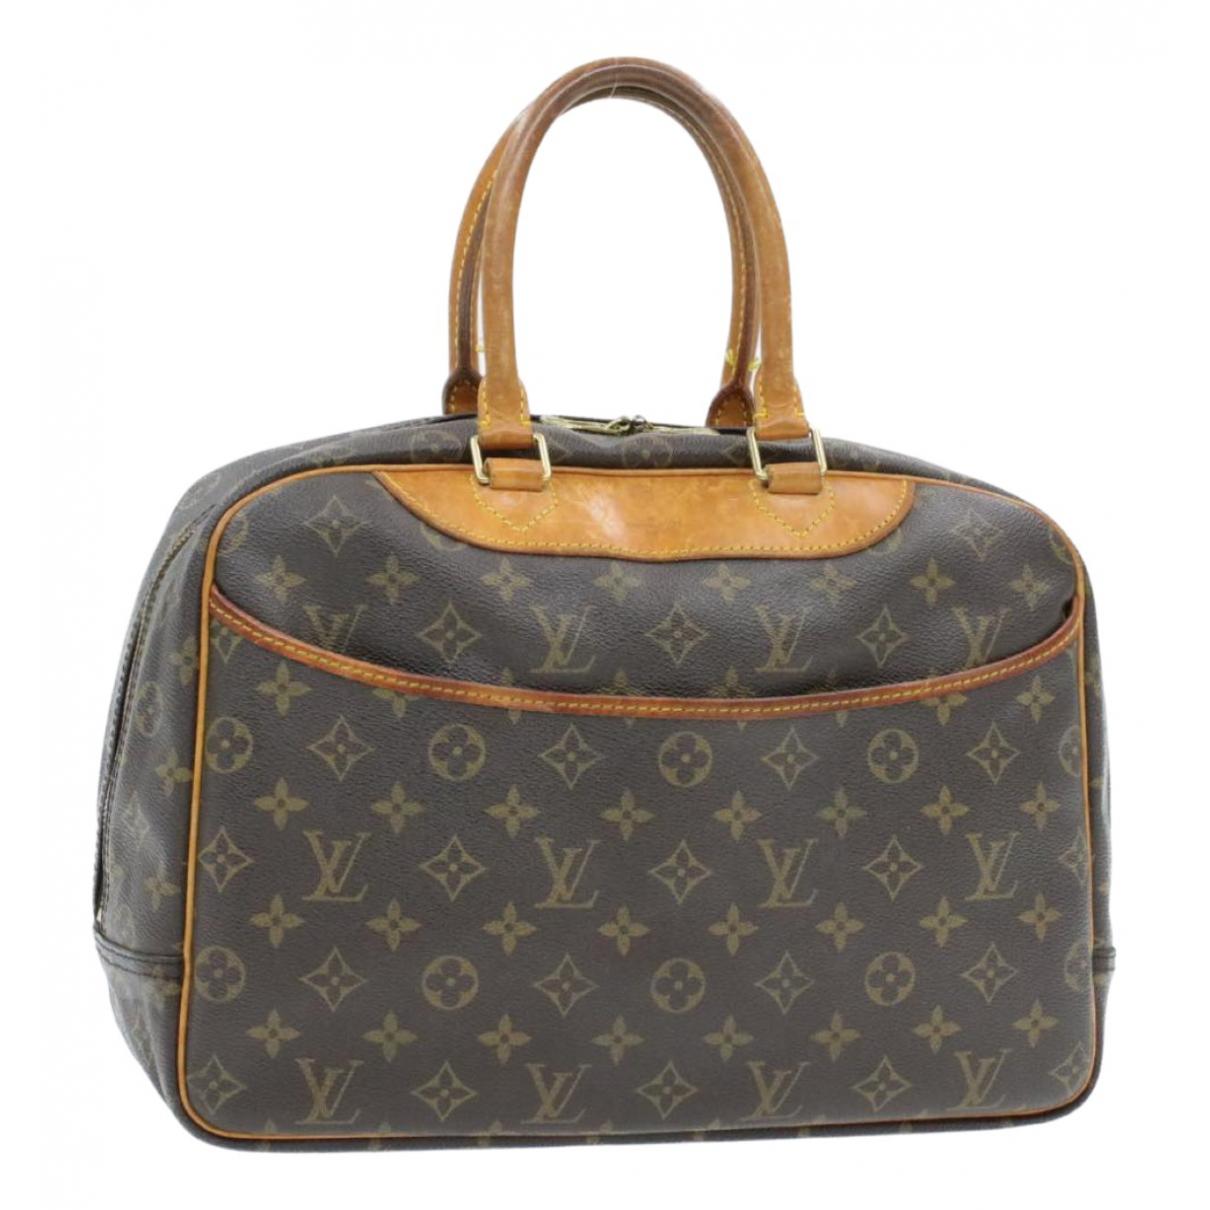 Louis Vuitton Deauville Brown Cloth Travel bag for Women N